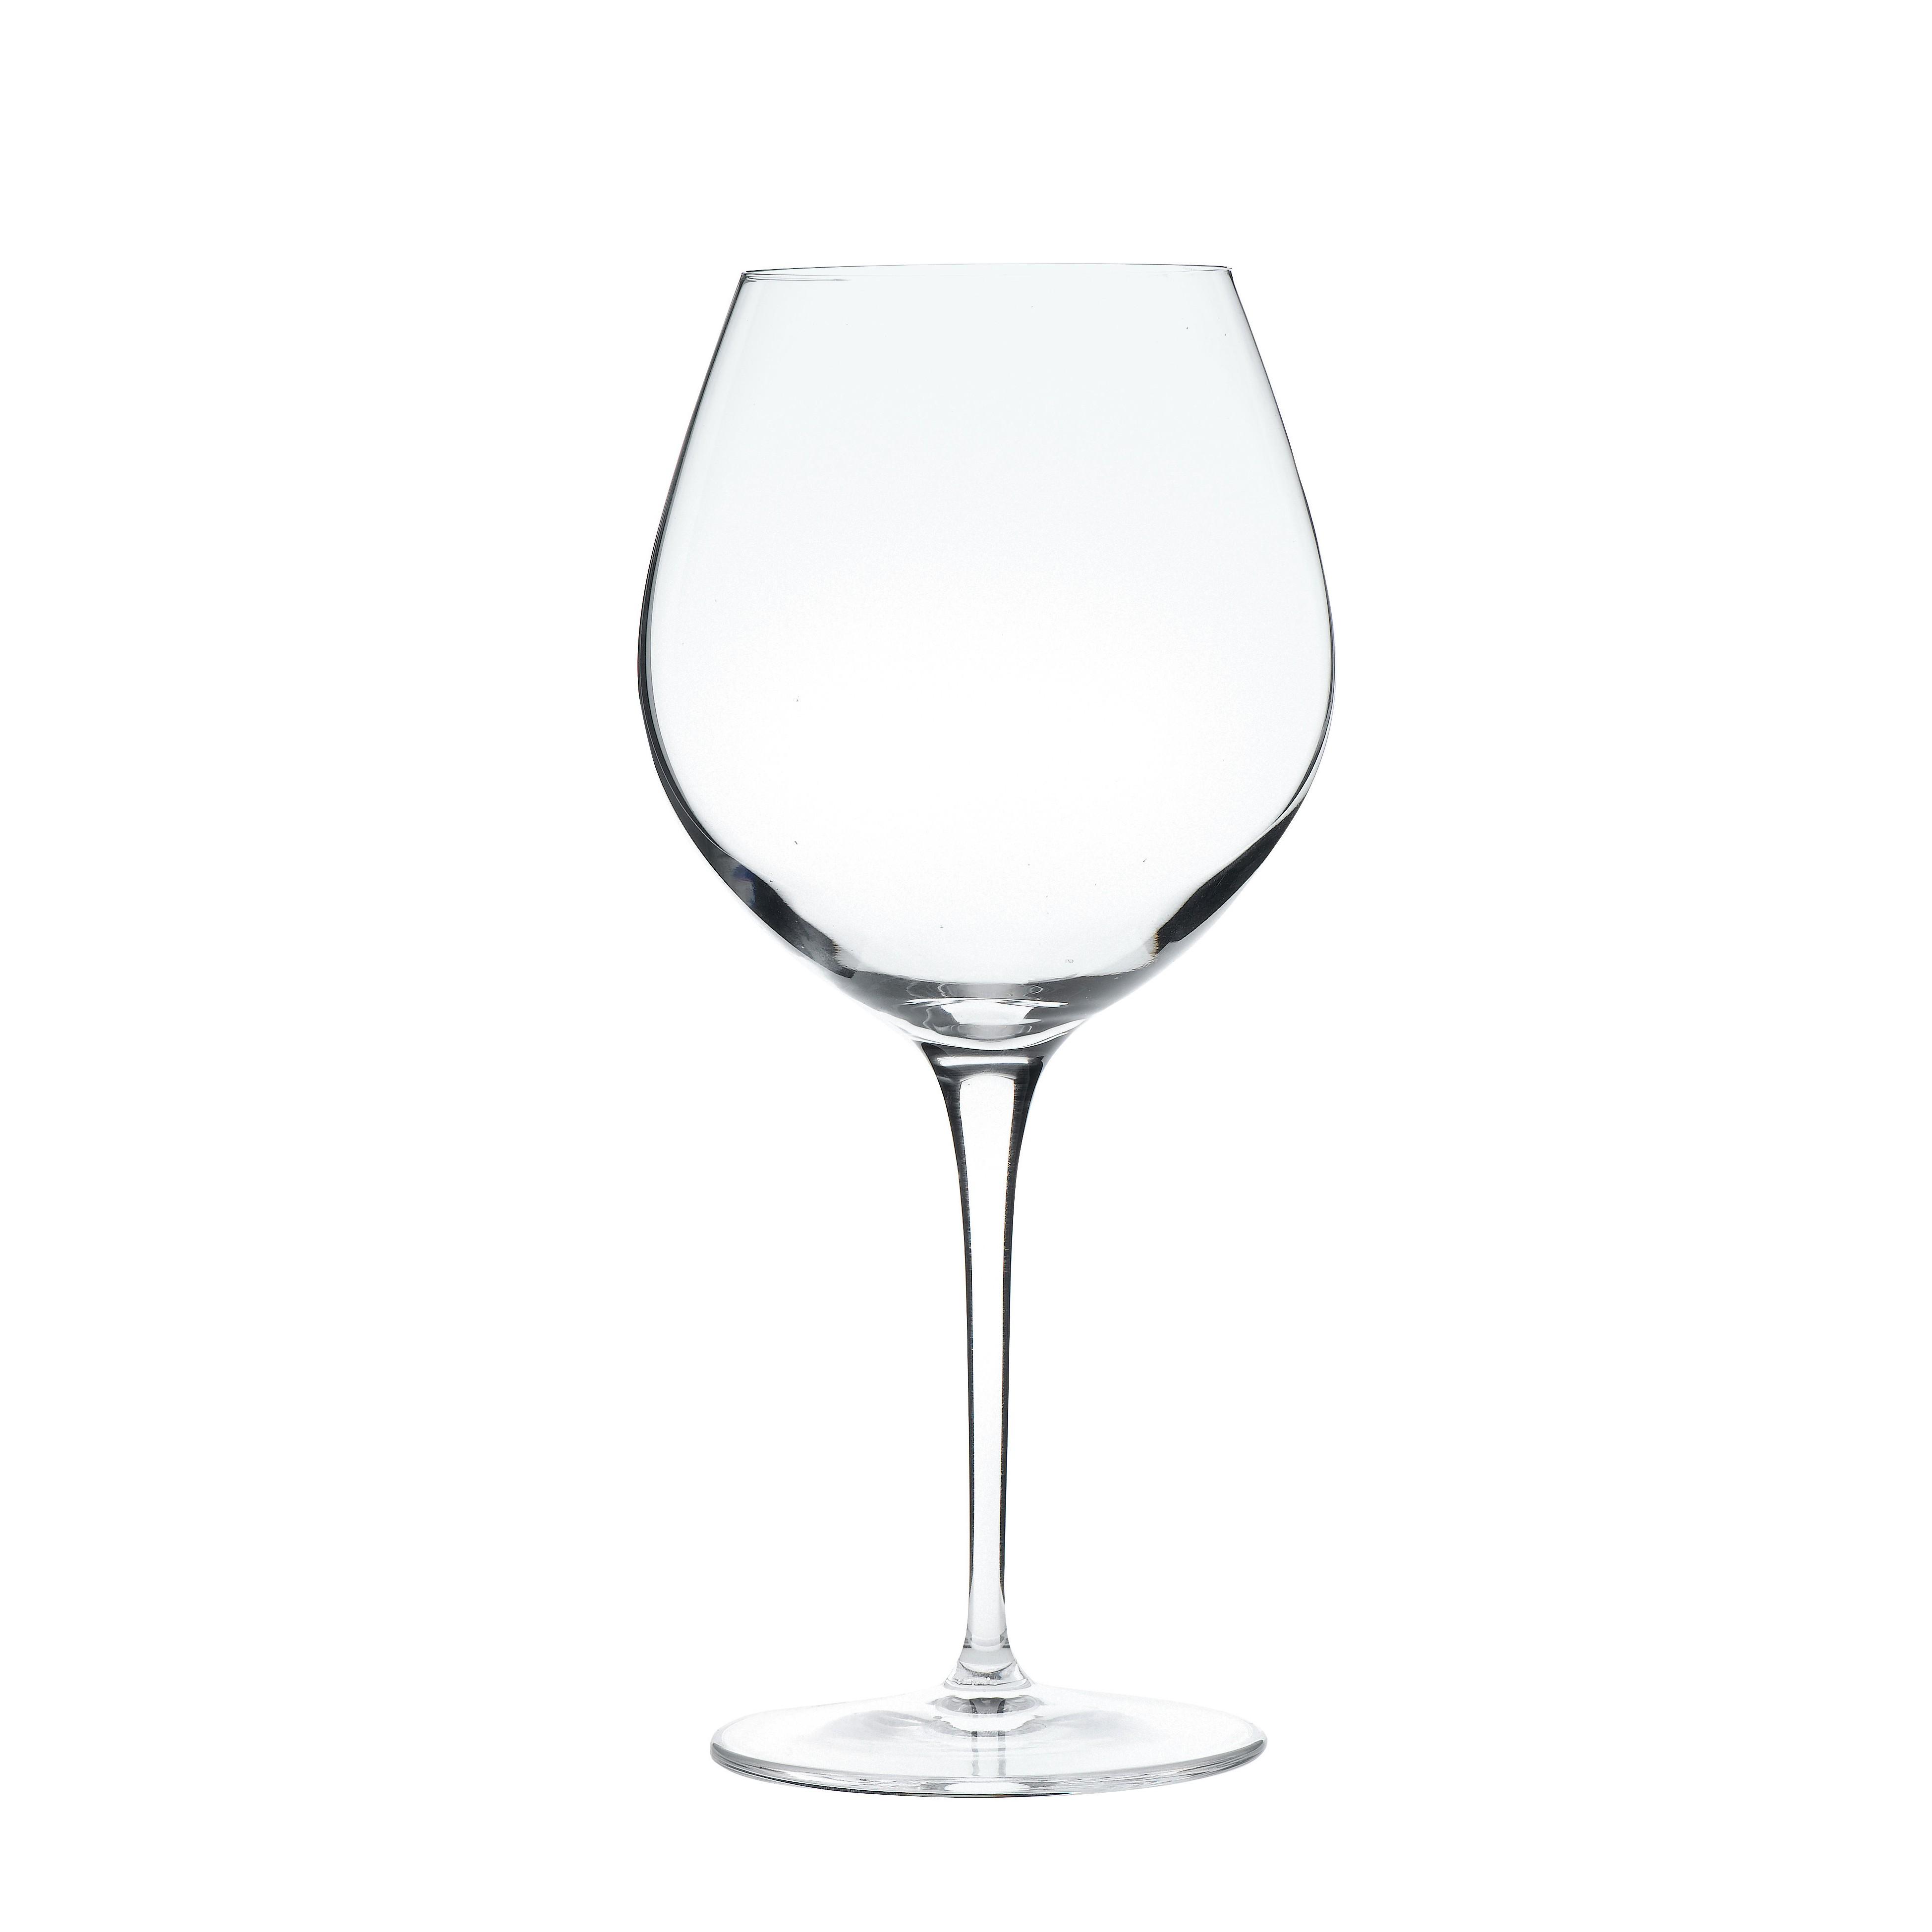 Vinoteque Robusto Wine Glasses 66cl 23.25oz